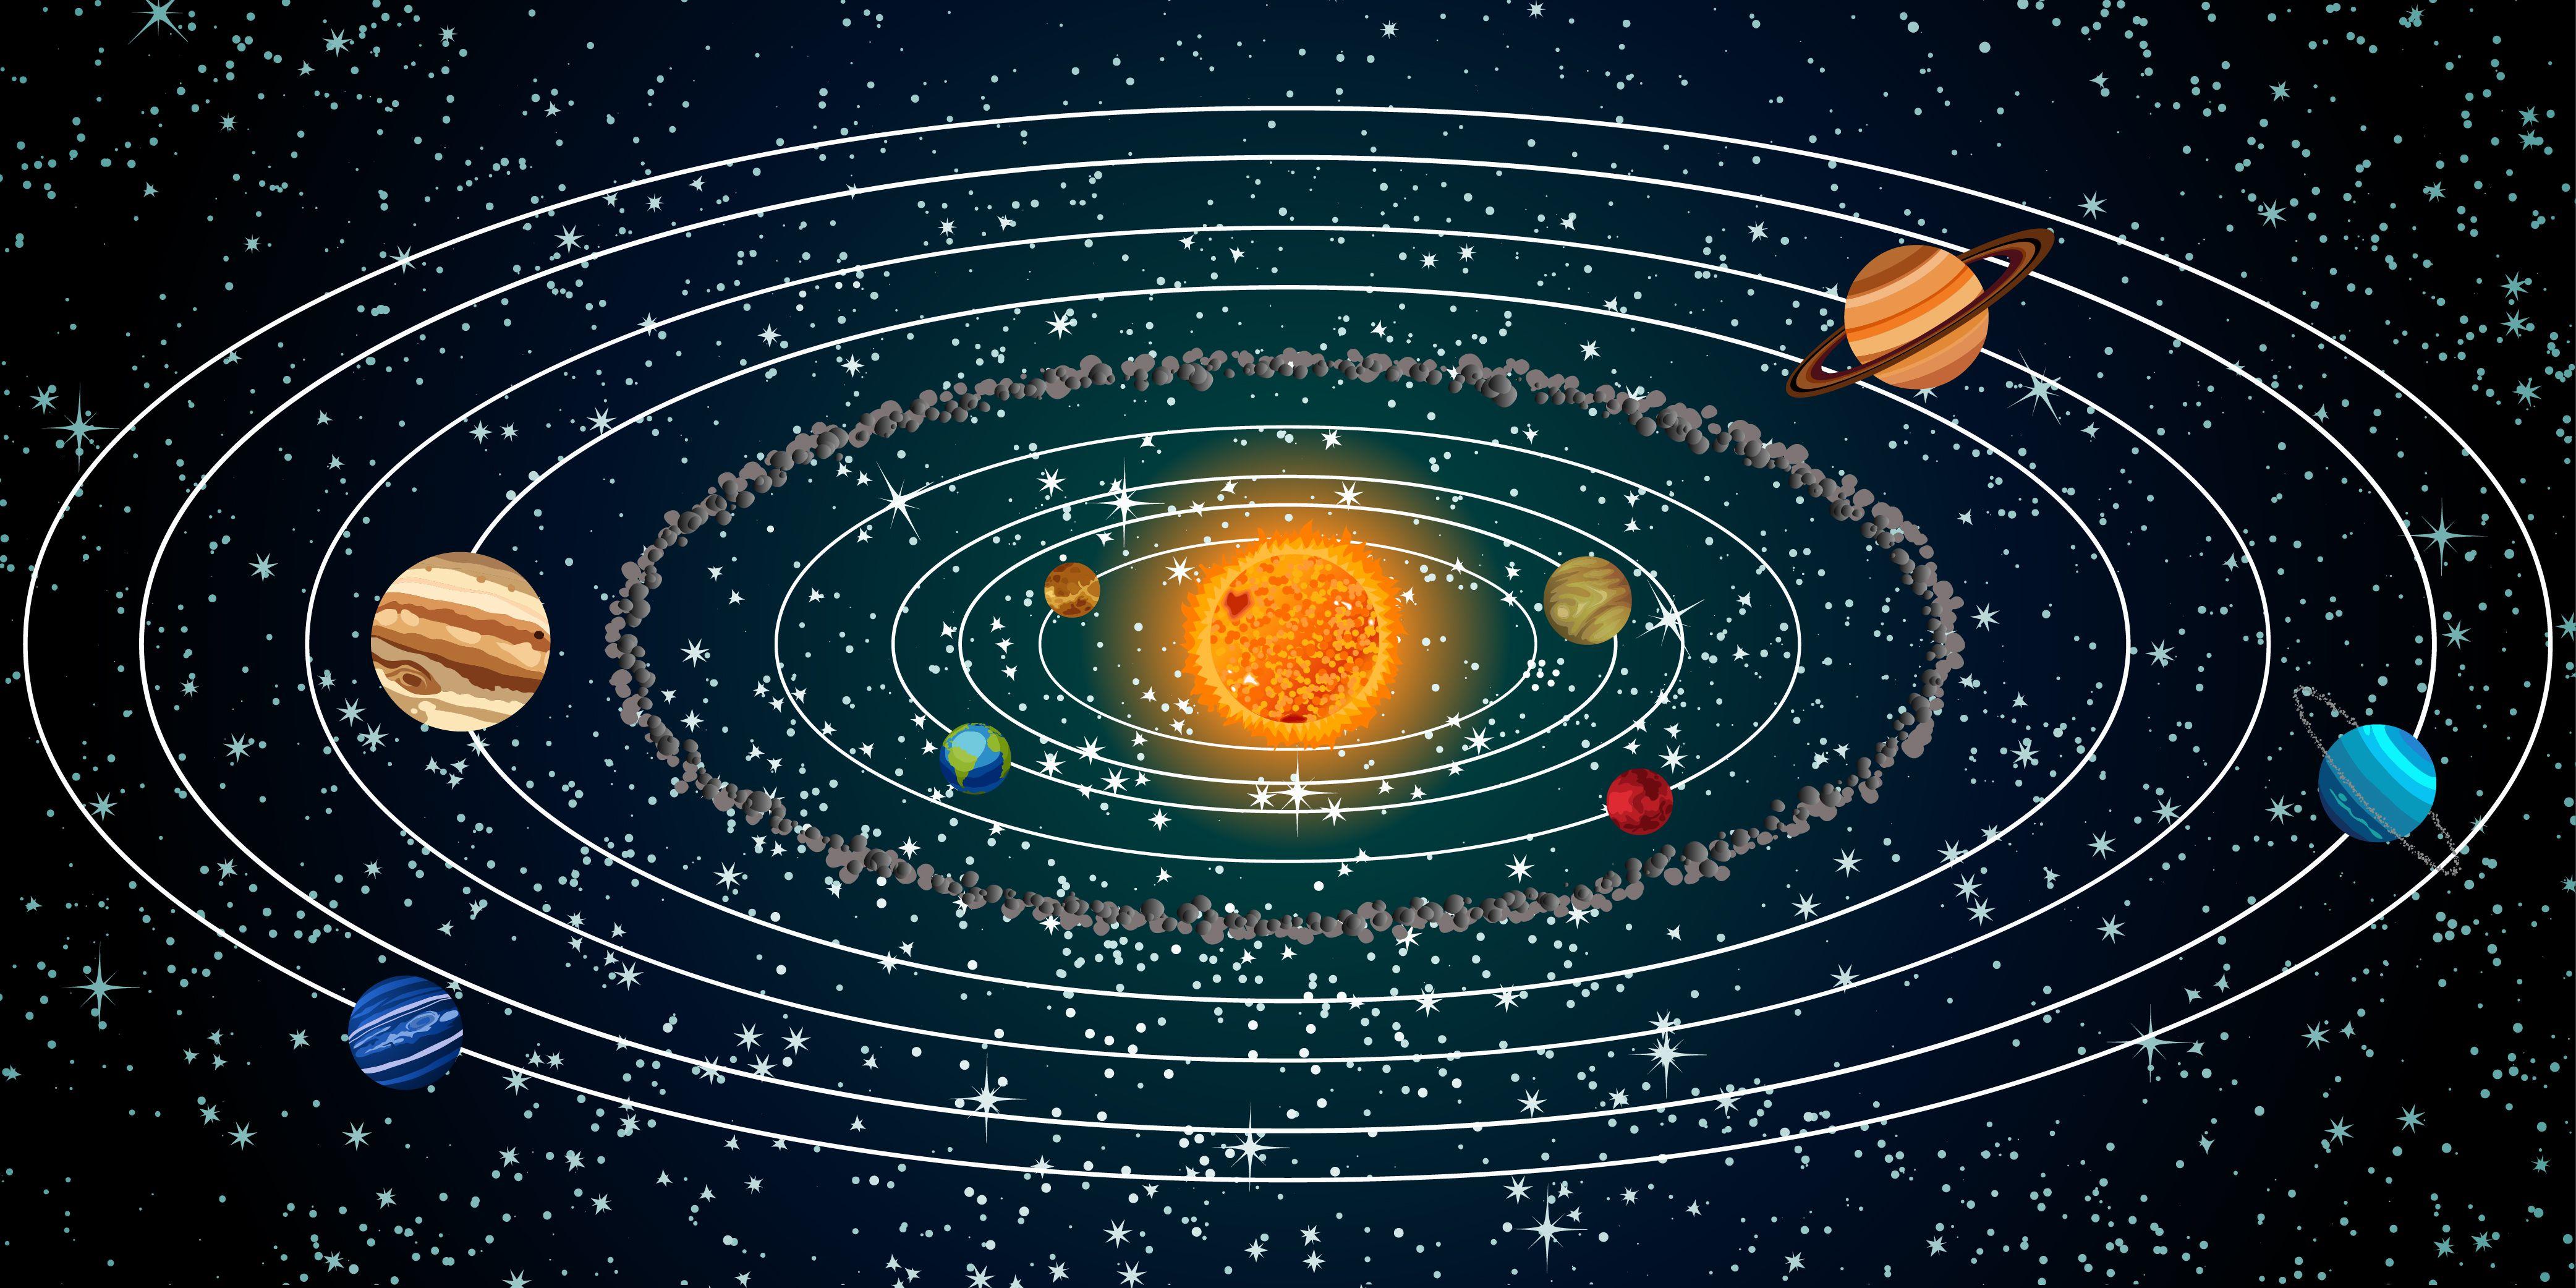 solar system planet order - Google Search | Solar system ...